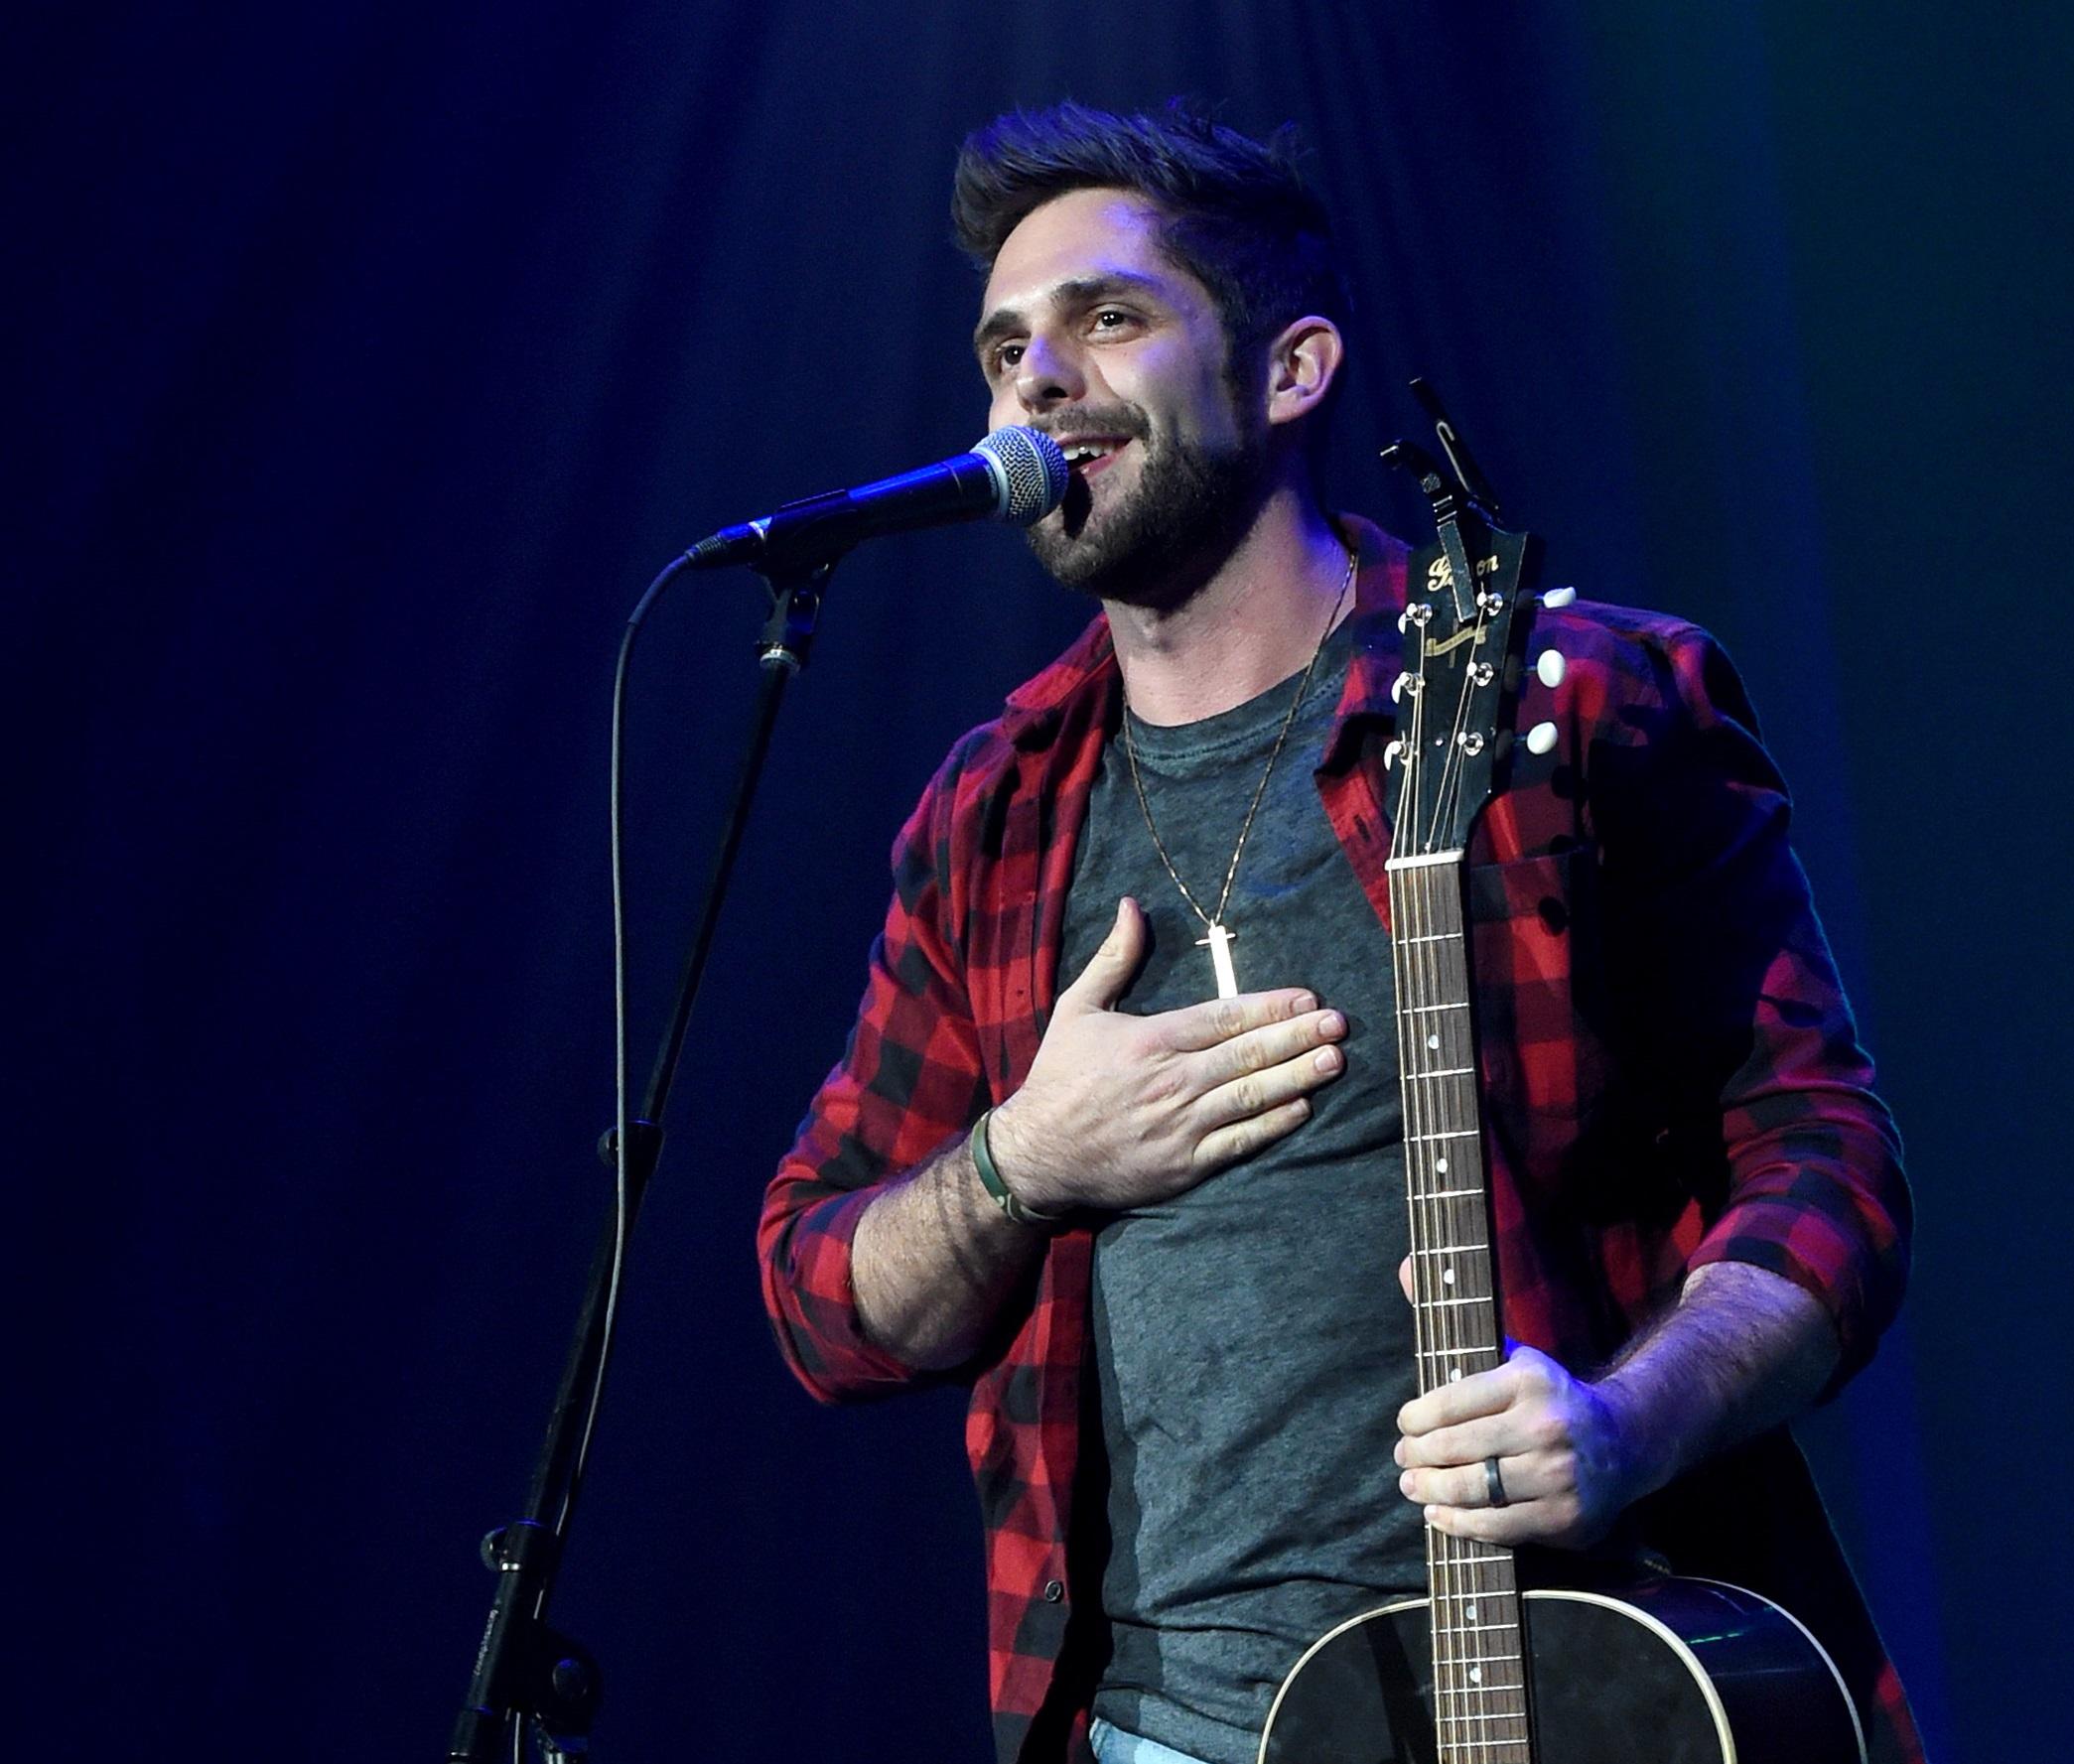 Thomas Rhett, Jon Pardi Surprise Fans at Georgia on My Mind Benefit Concert